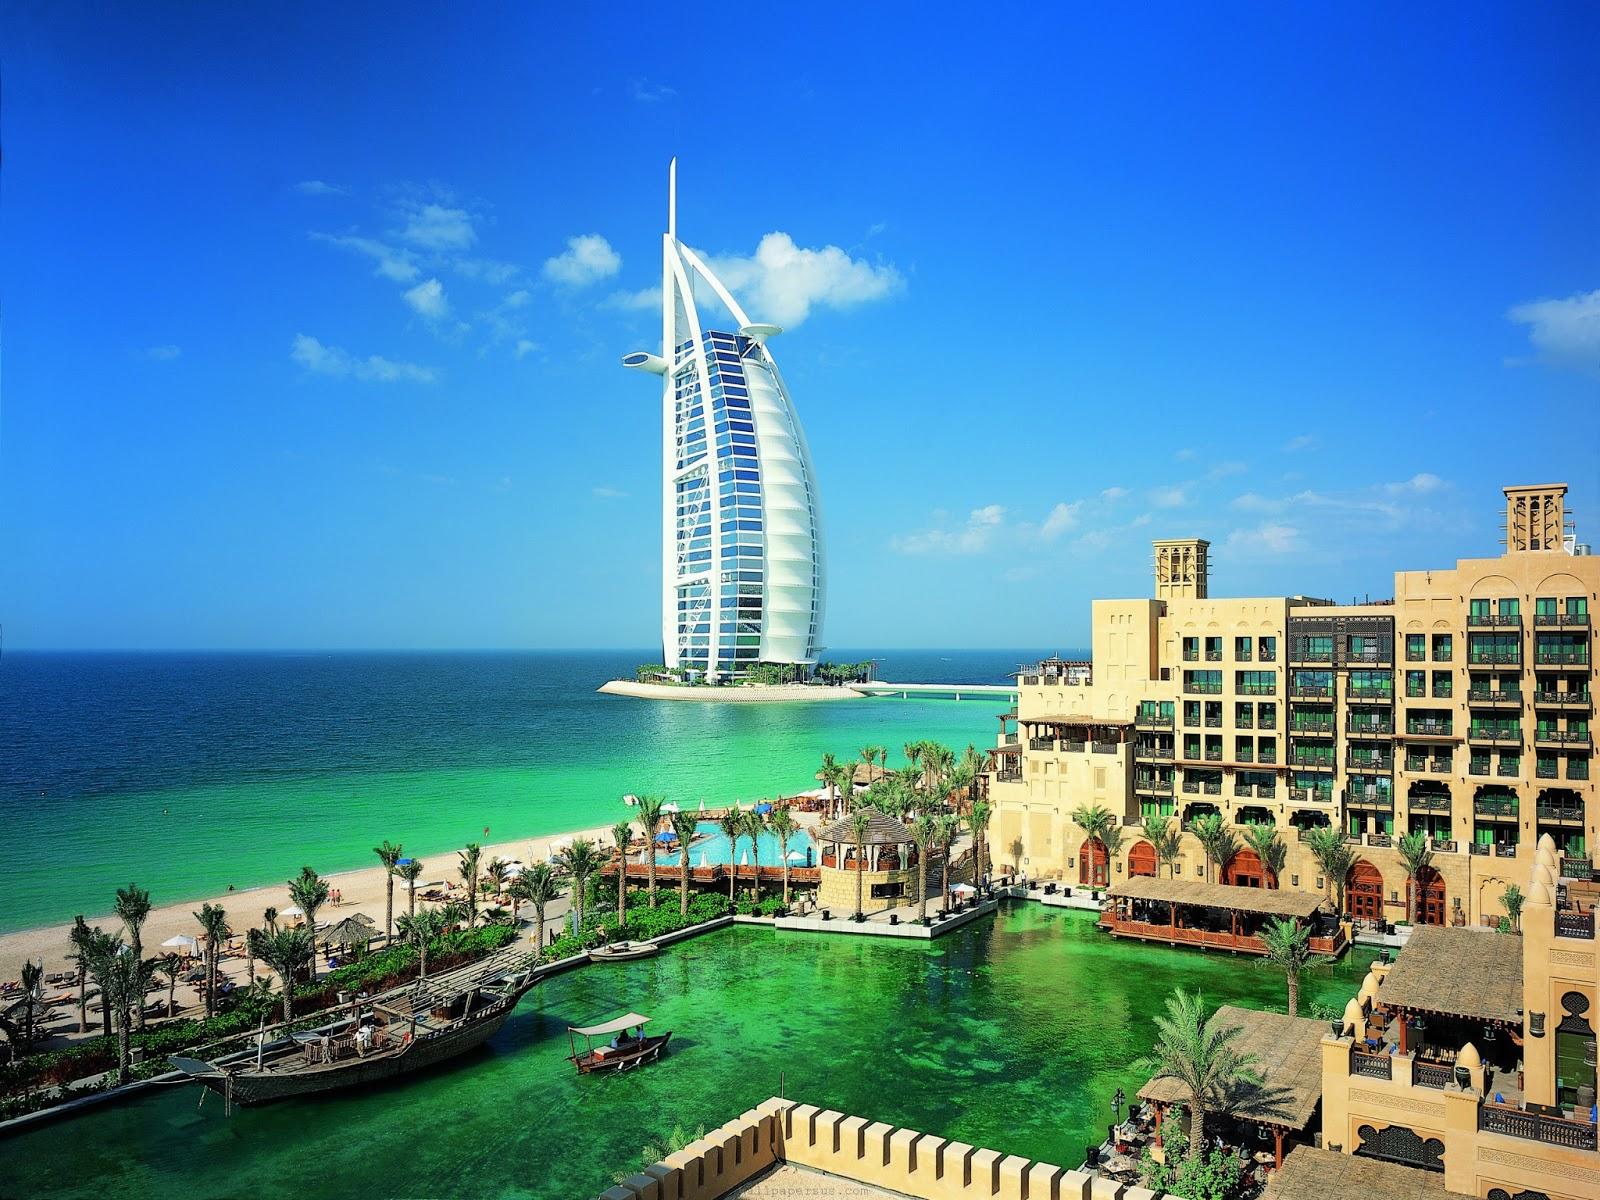 Dubai-things-to-do-in-dubai-uae